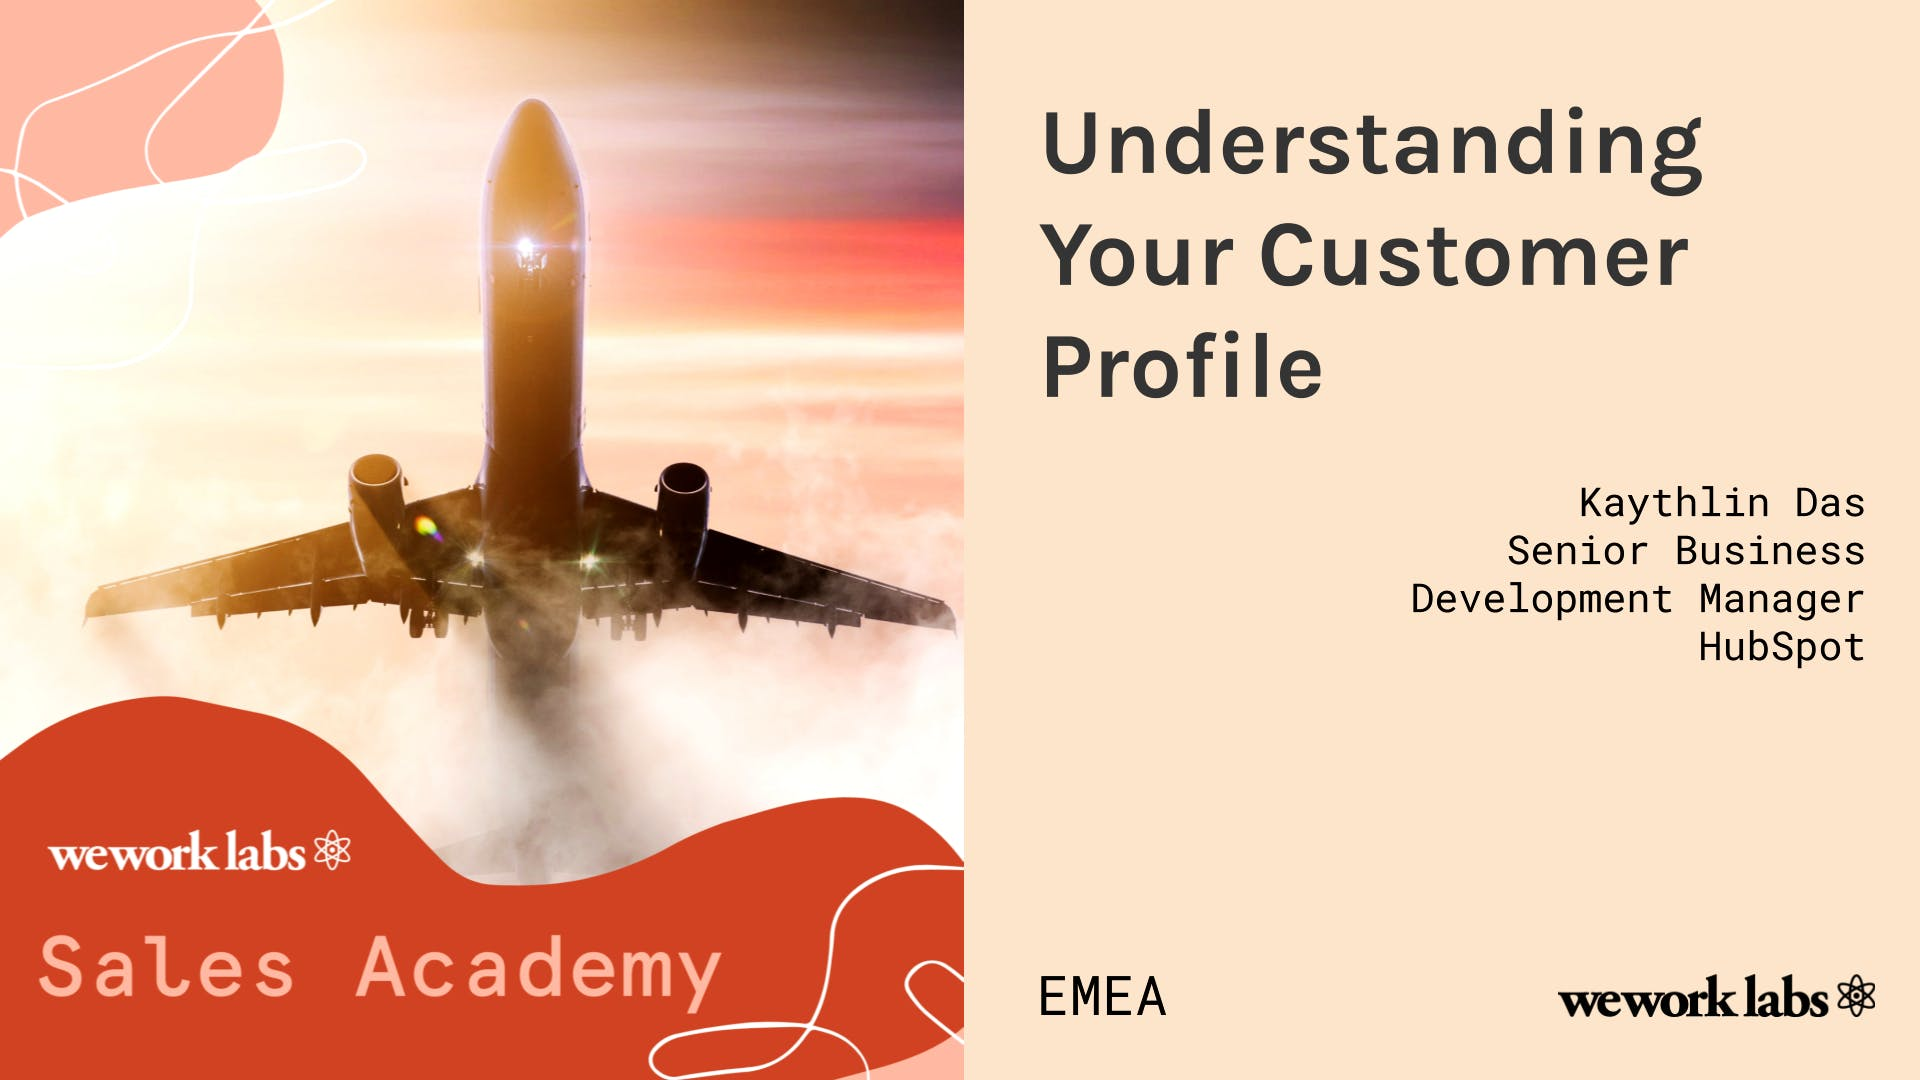 Sales Academy (EMEA): Understanding your Customer Profile